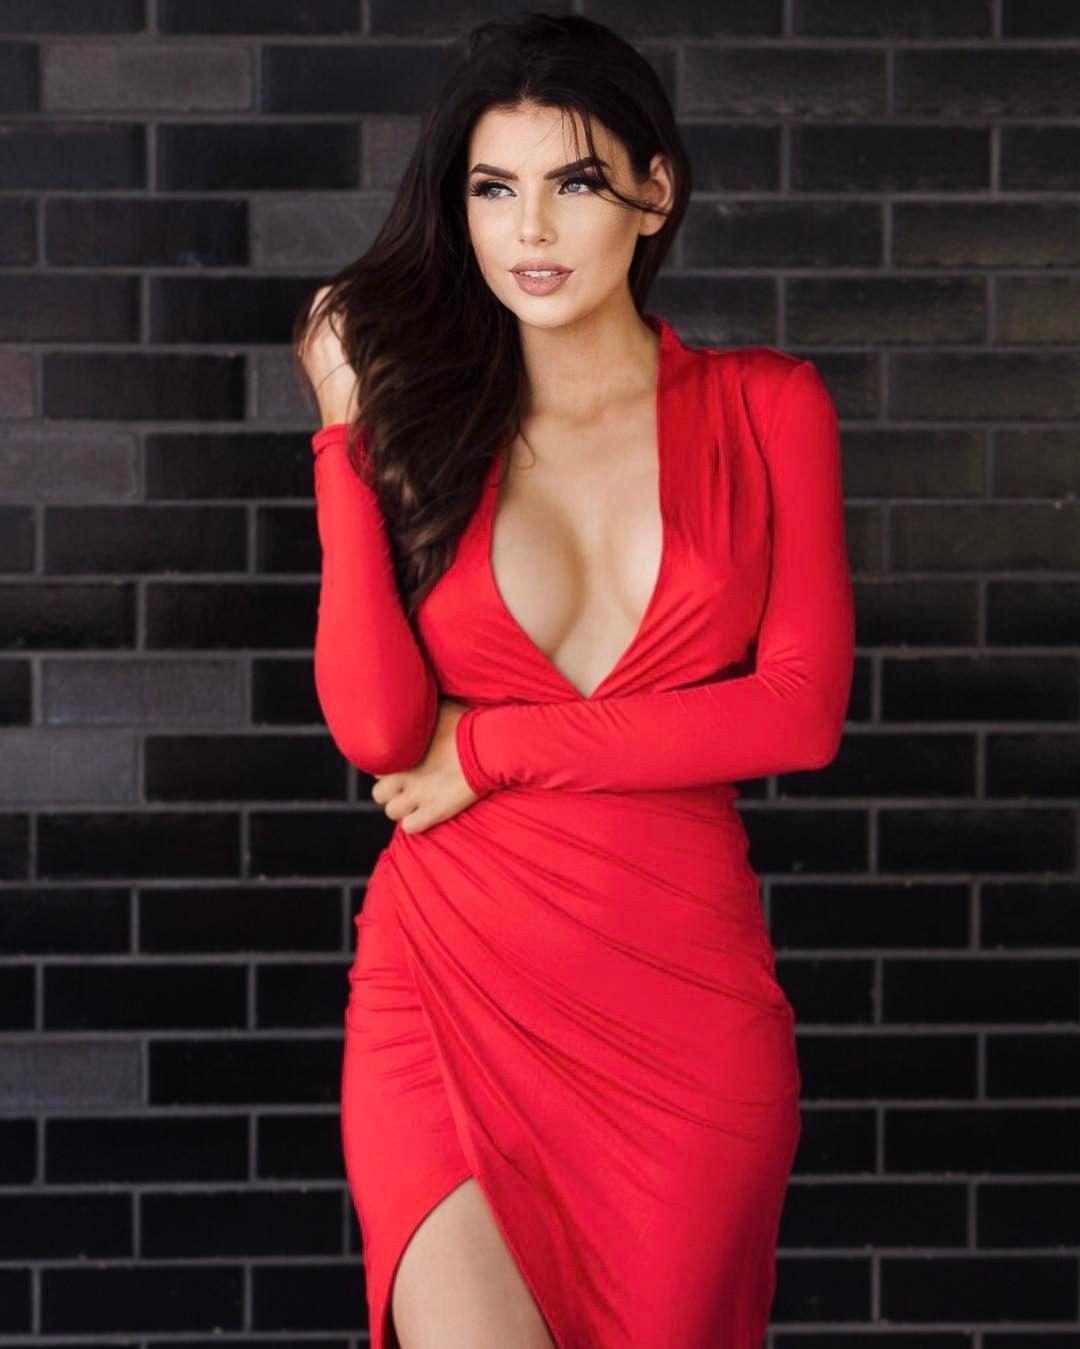 Pictures Kristina Mendonca nude photos 2019